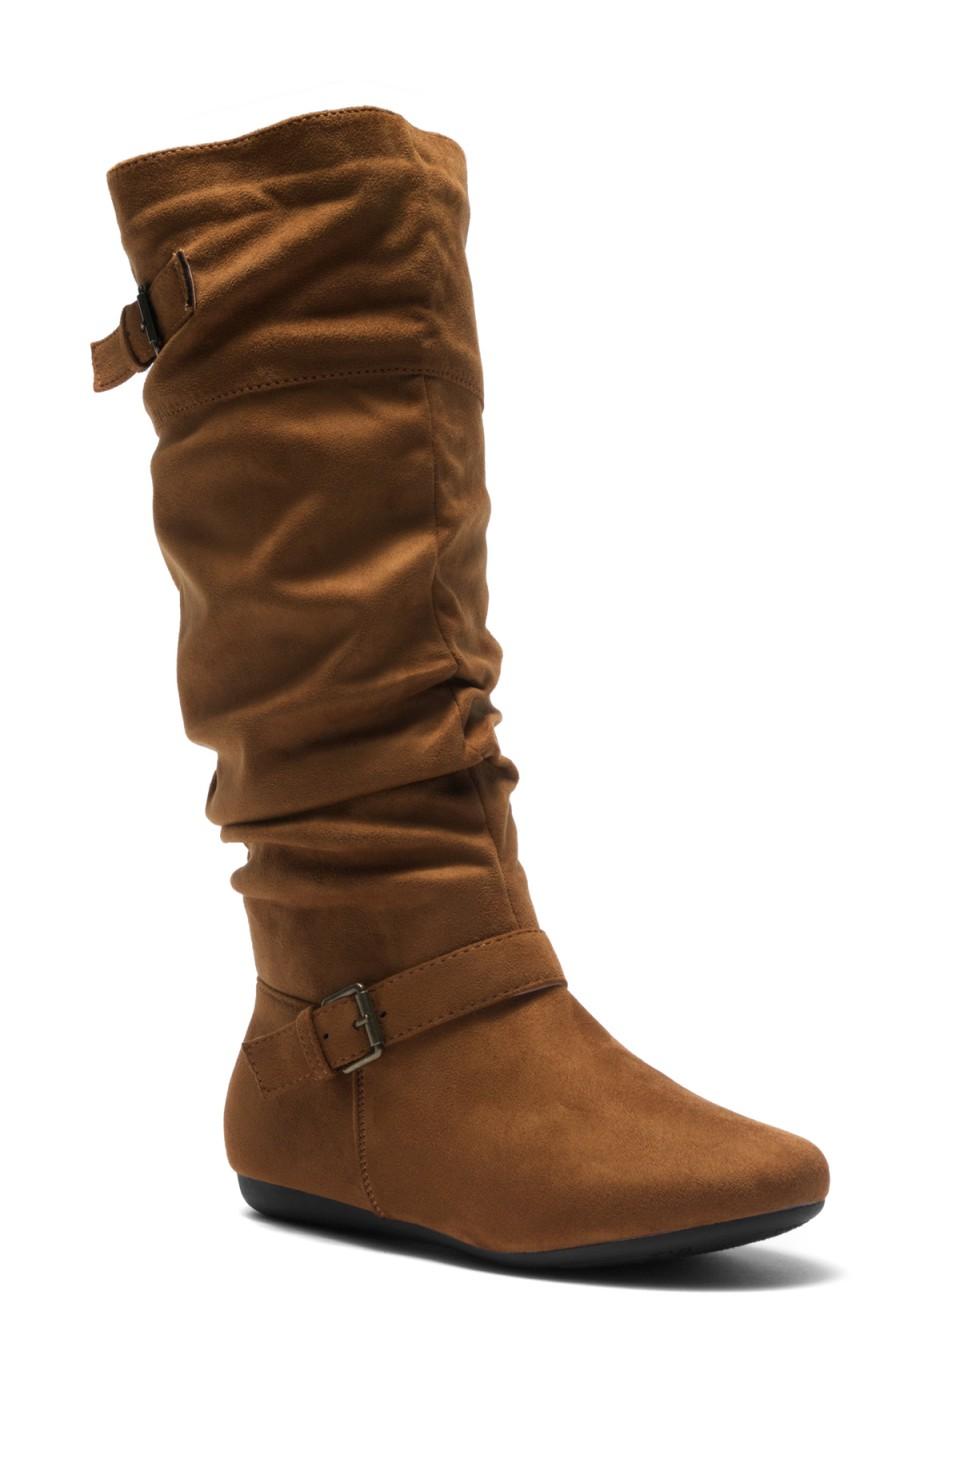 Women's Cognac Slollie Faux Suede Calf Length Slouchy Buckled Up Boots